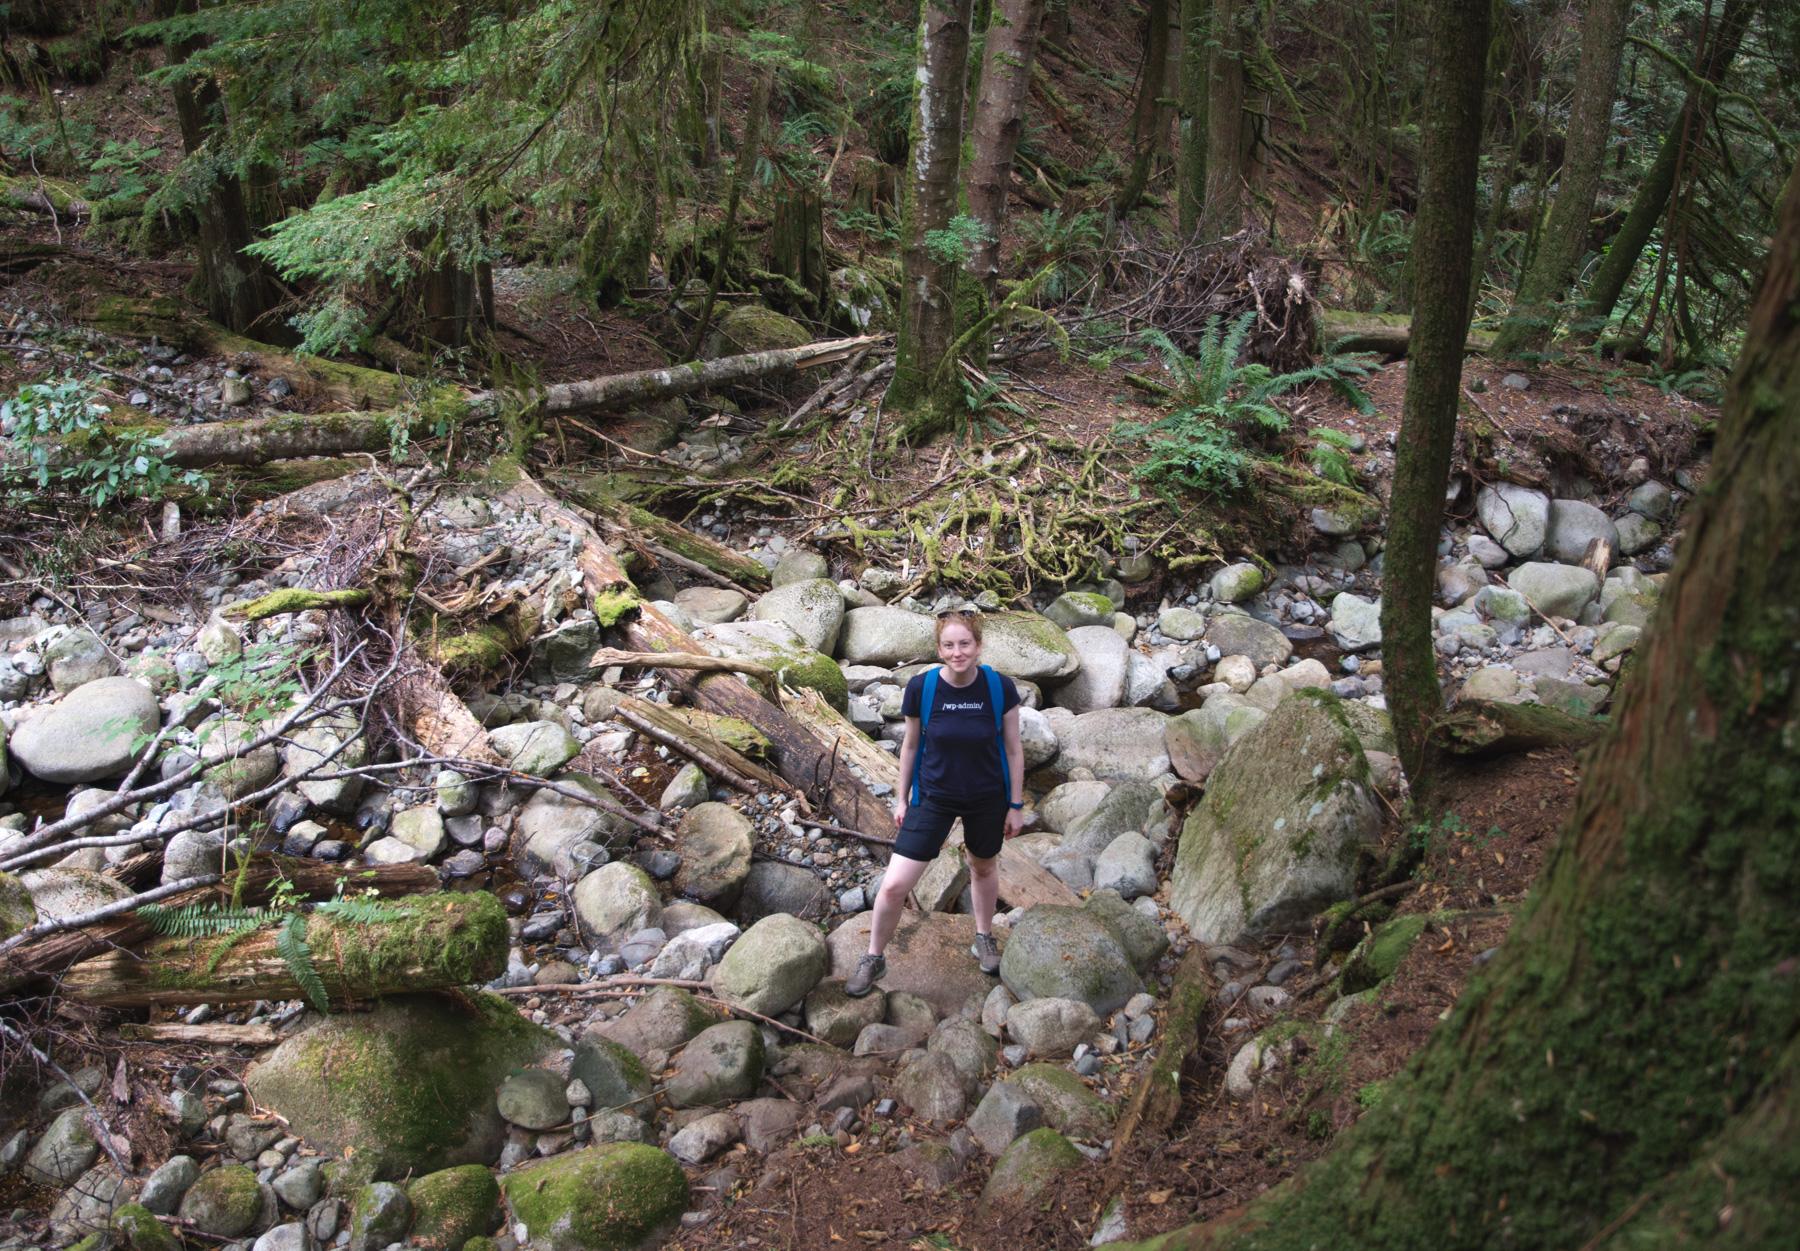 Standing amongst rocks